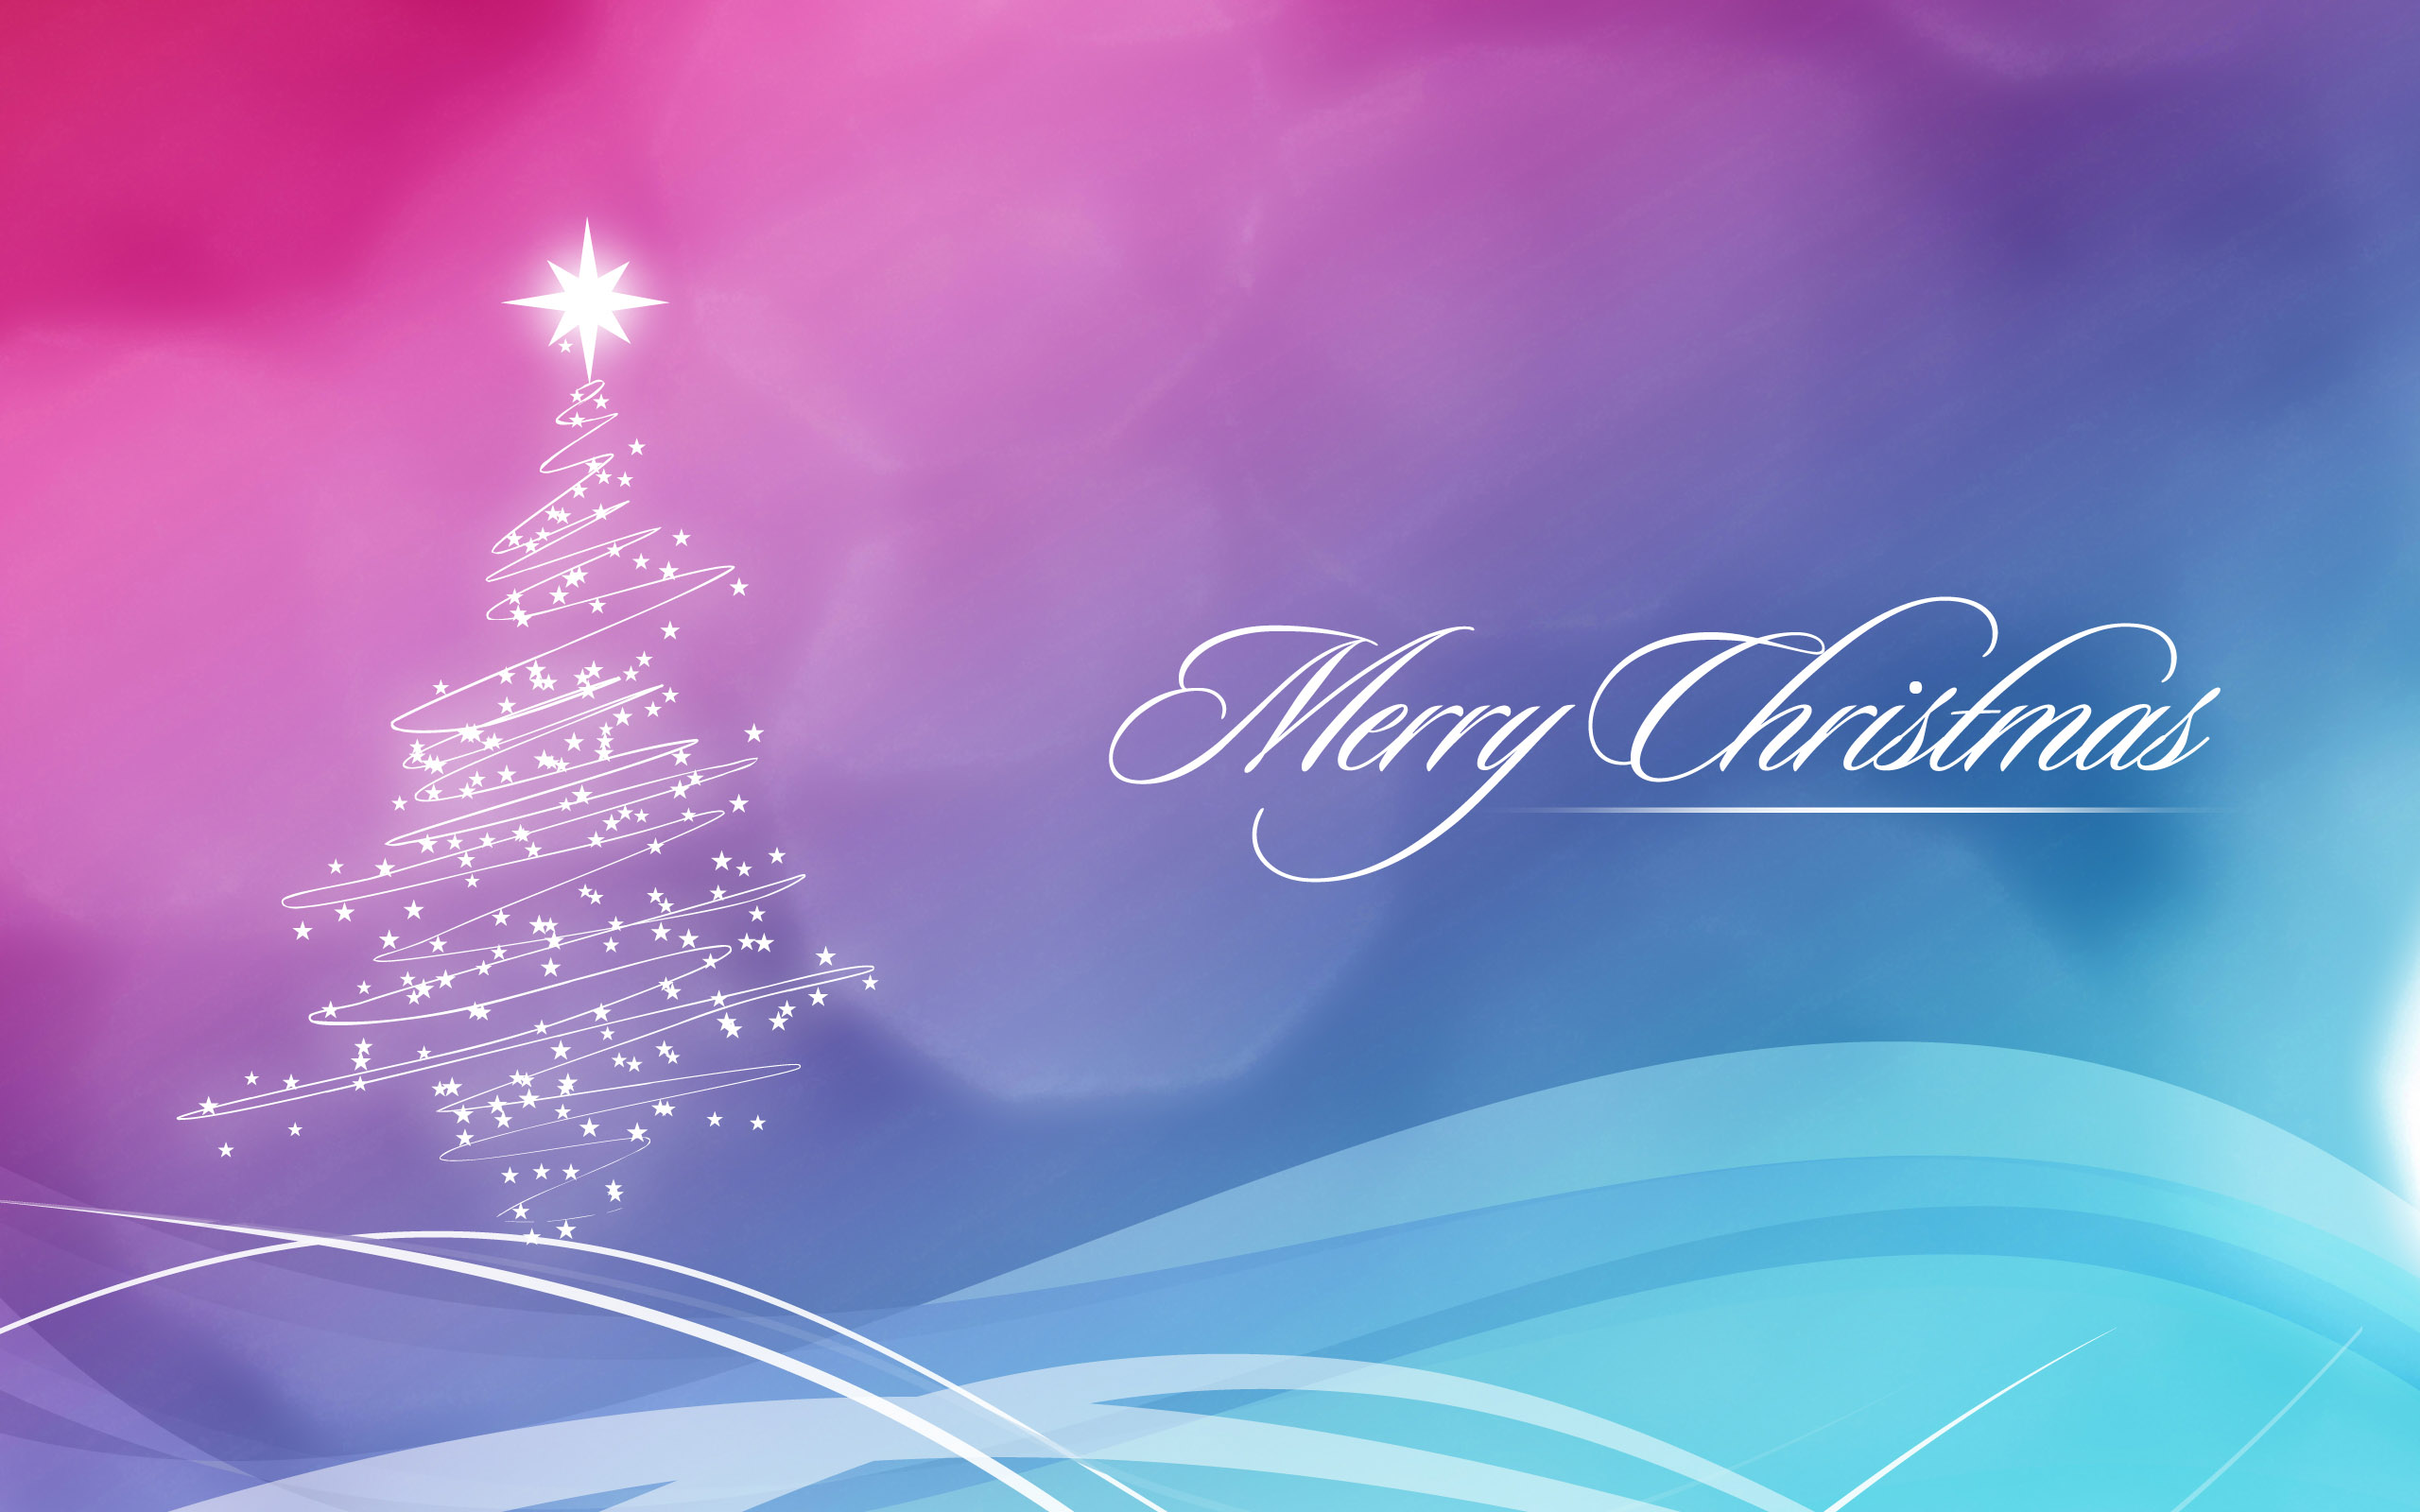 Christmas Wallpapers For Desktop - Beautiful Wallpaper